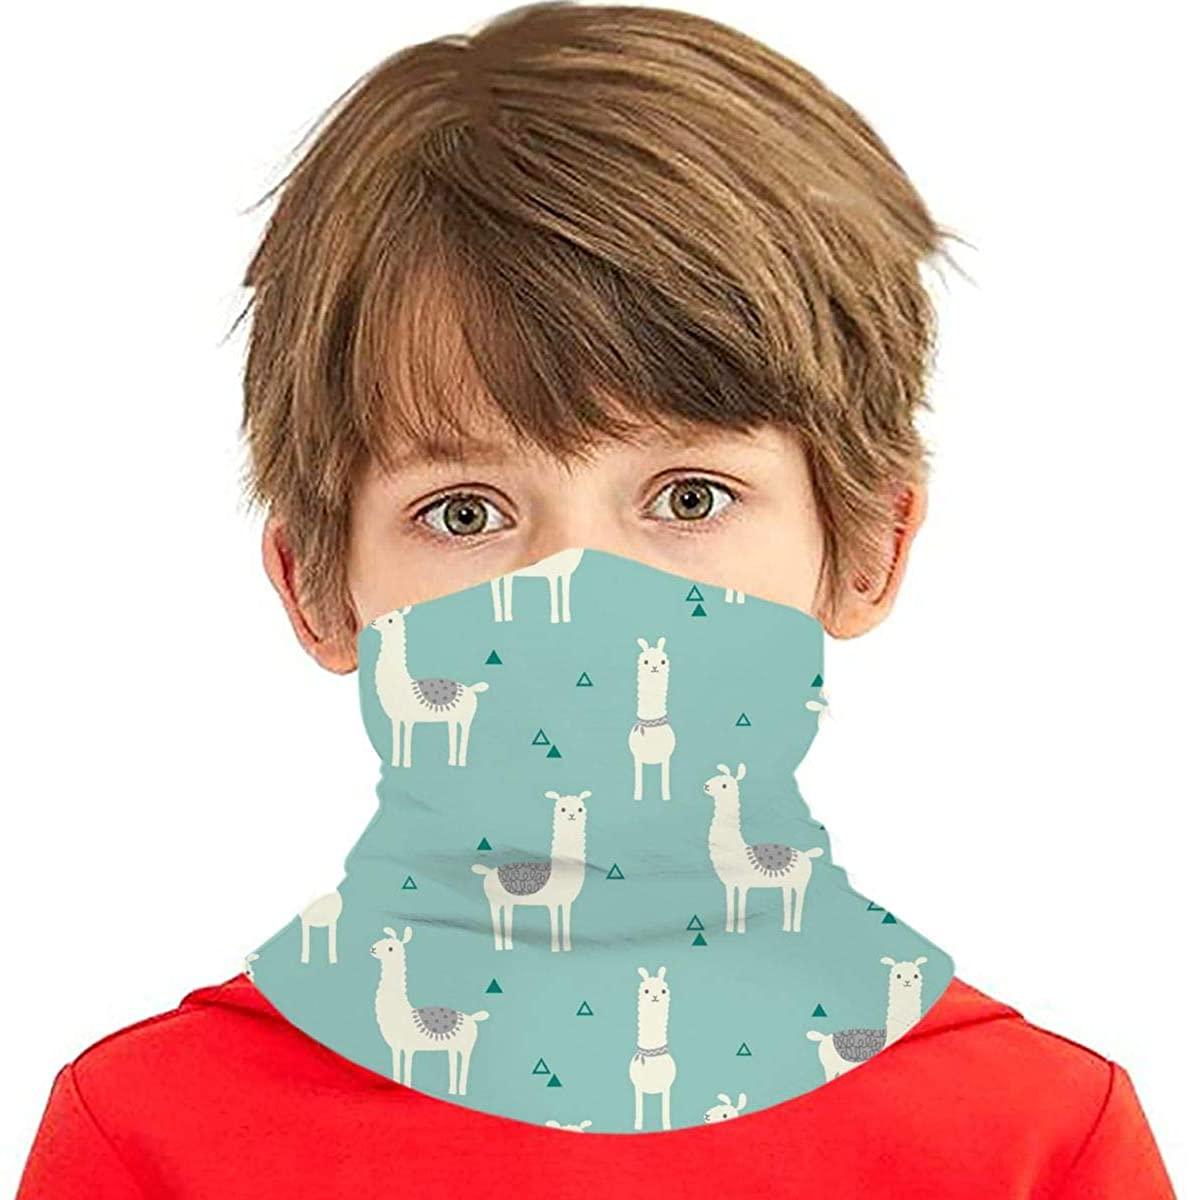 Youth Face Bandanas, Alpaca Reusable Face Mask Half Face Towel Mouth Cloth Facial Scarf Variety Headscarf